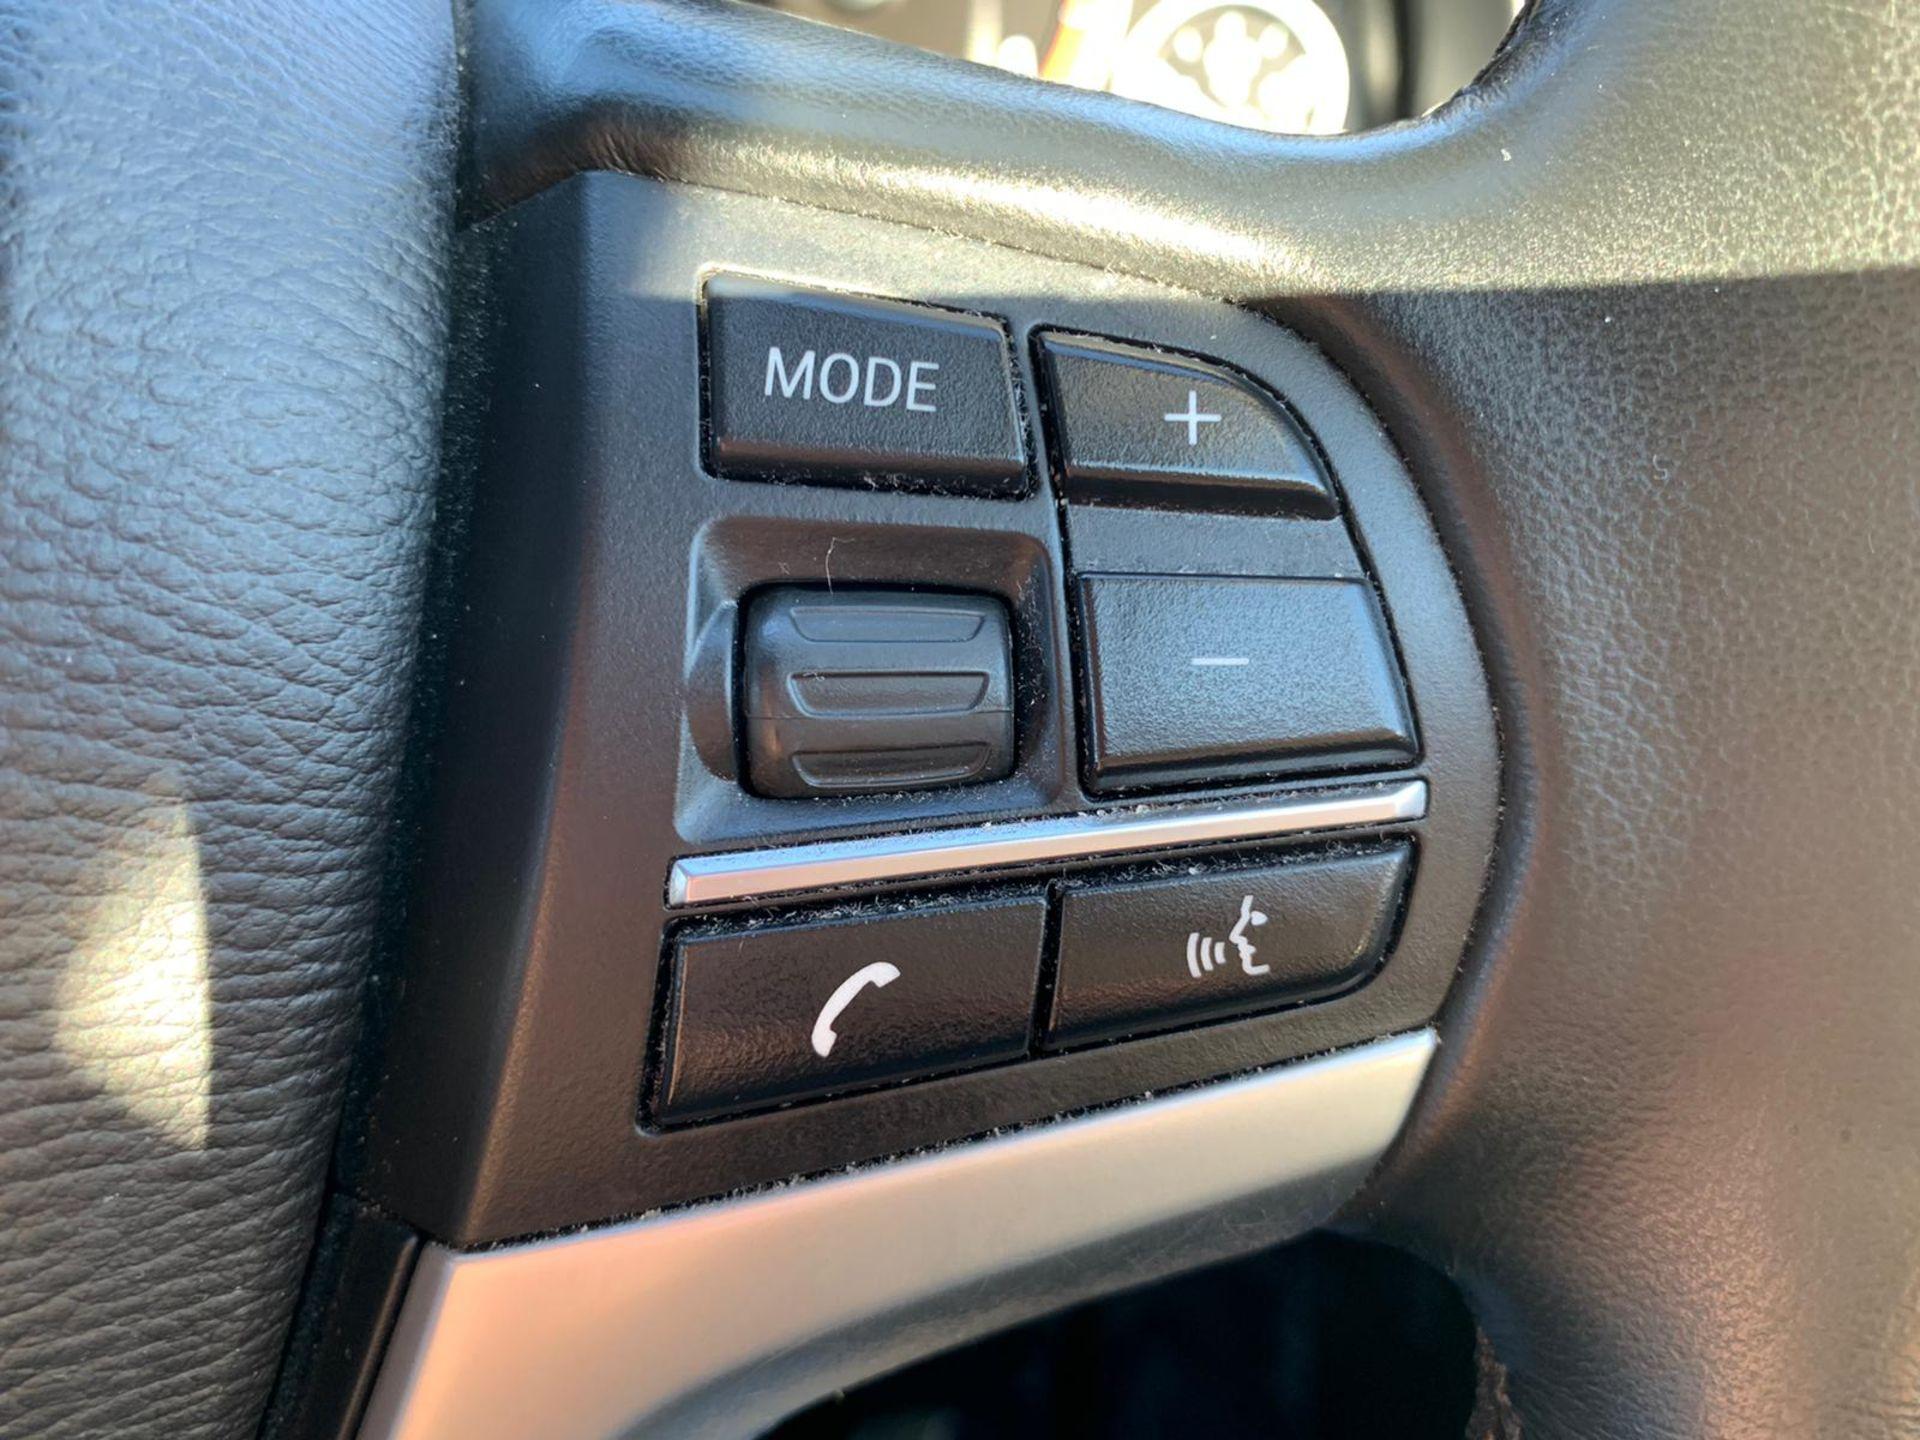 "(Reserve Met) BMW X5 2.0d S-DRIVE ""Special Equipment"" Auto- 7 Seater -16 Reg - Sat Nav- (New Shape) - Image 33 of 43"